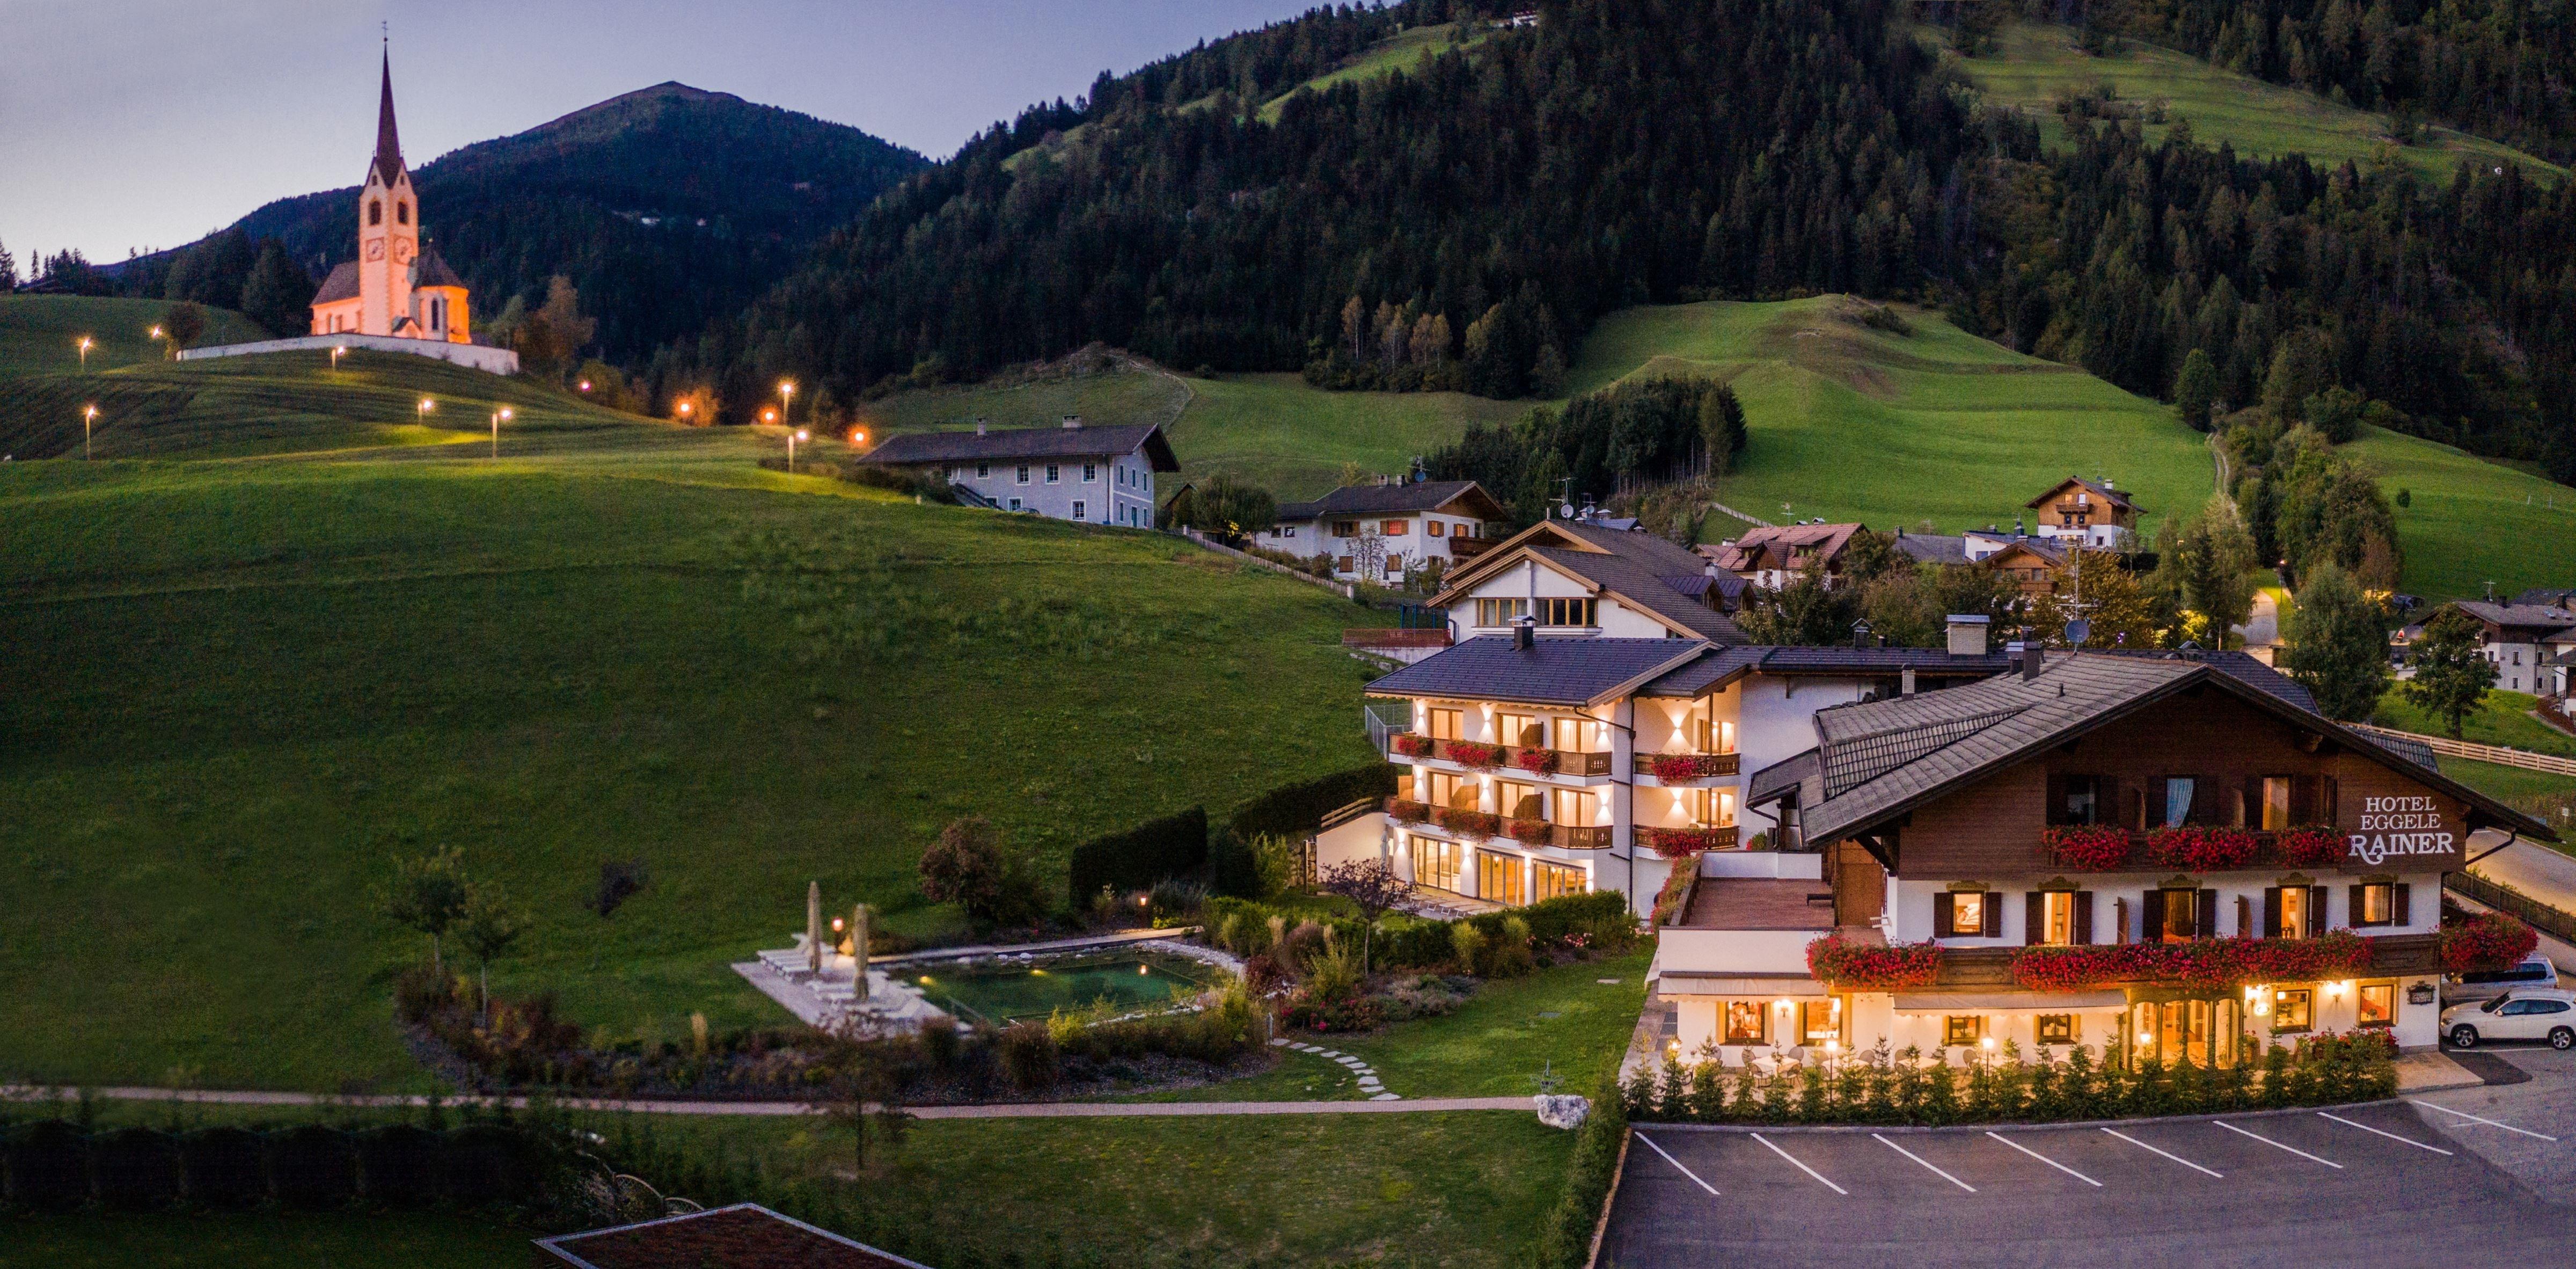 Hotel & Residence Rainer Eggele - Prato alla Drava, San ...